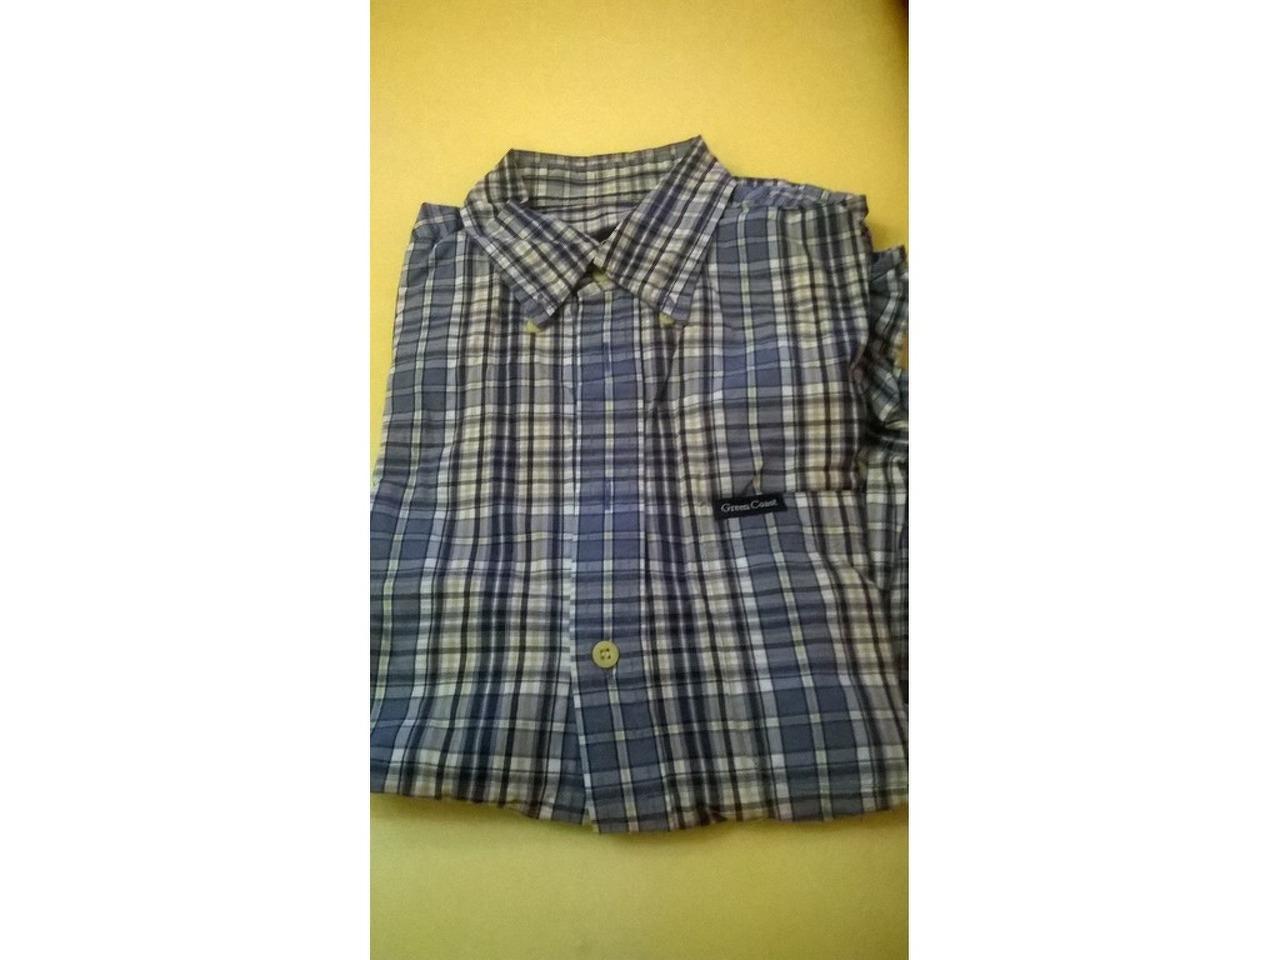 Camisas Barred's, G.Coast, C.Jeans, Cayo Largo, LOGG, N.Corrêa, etc - 8/8